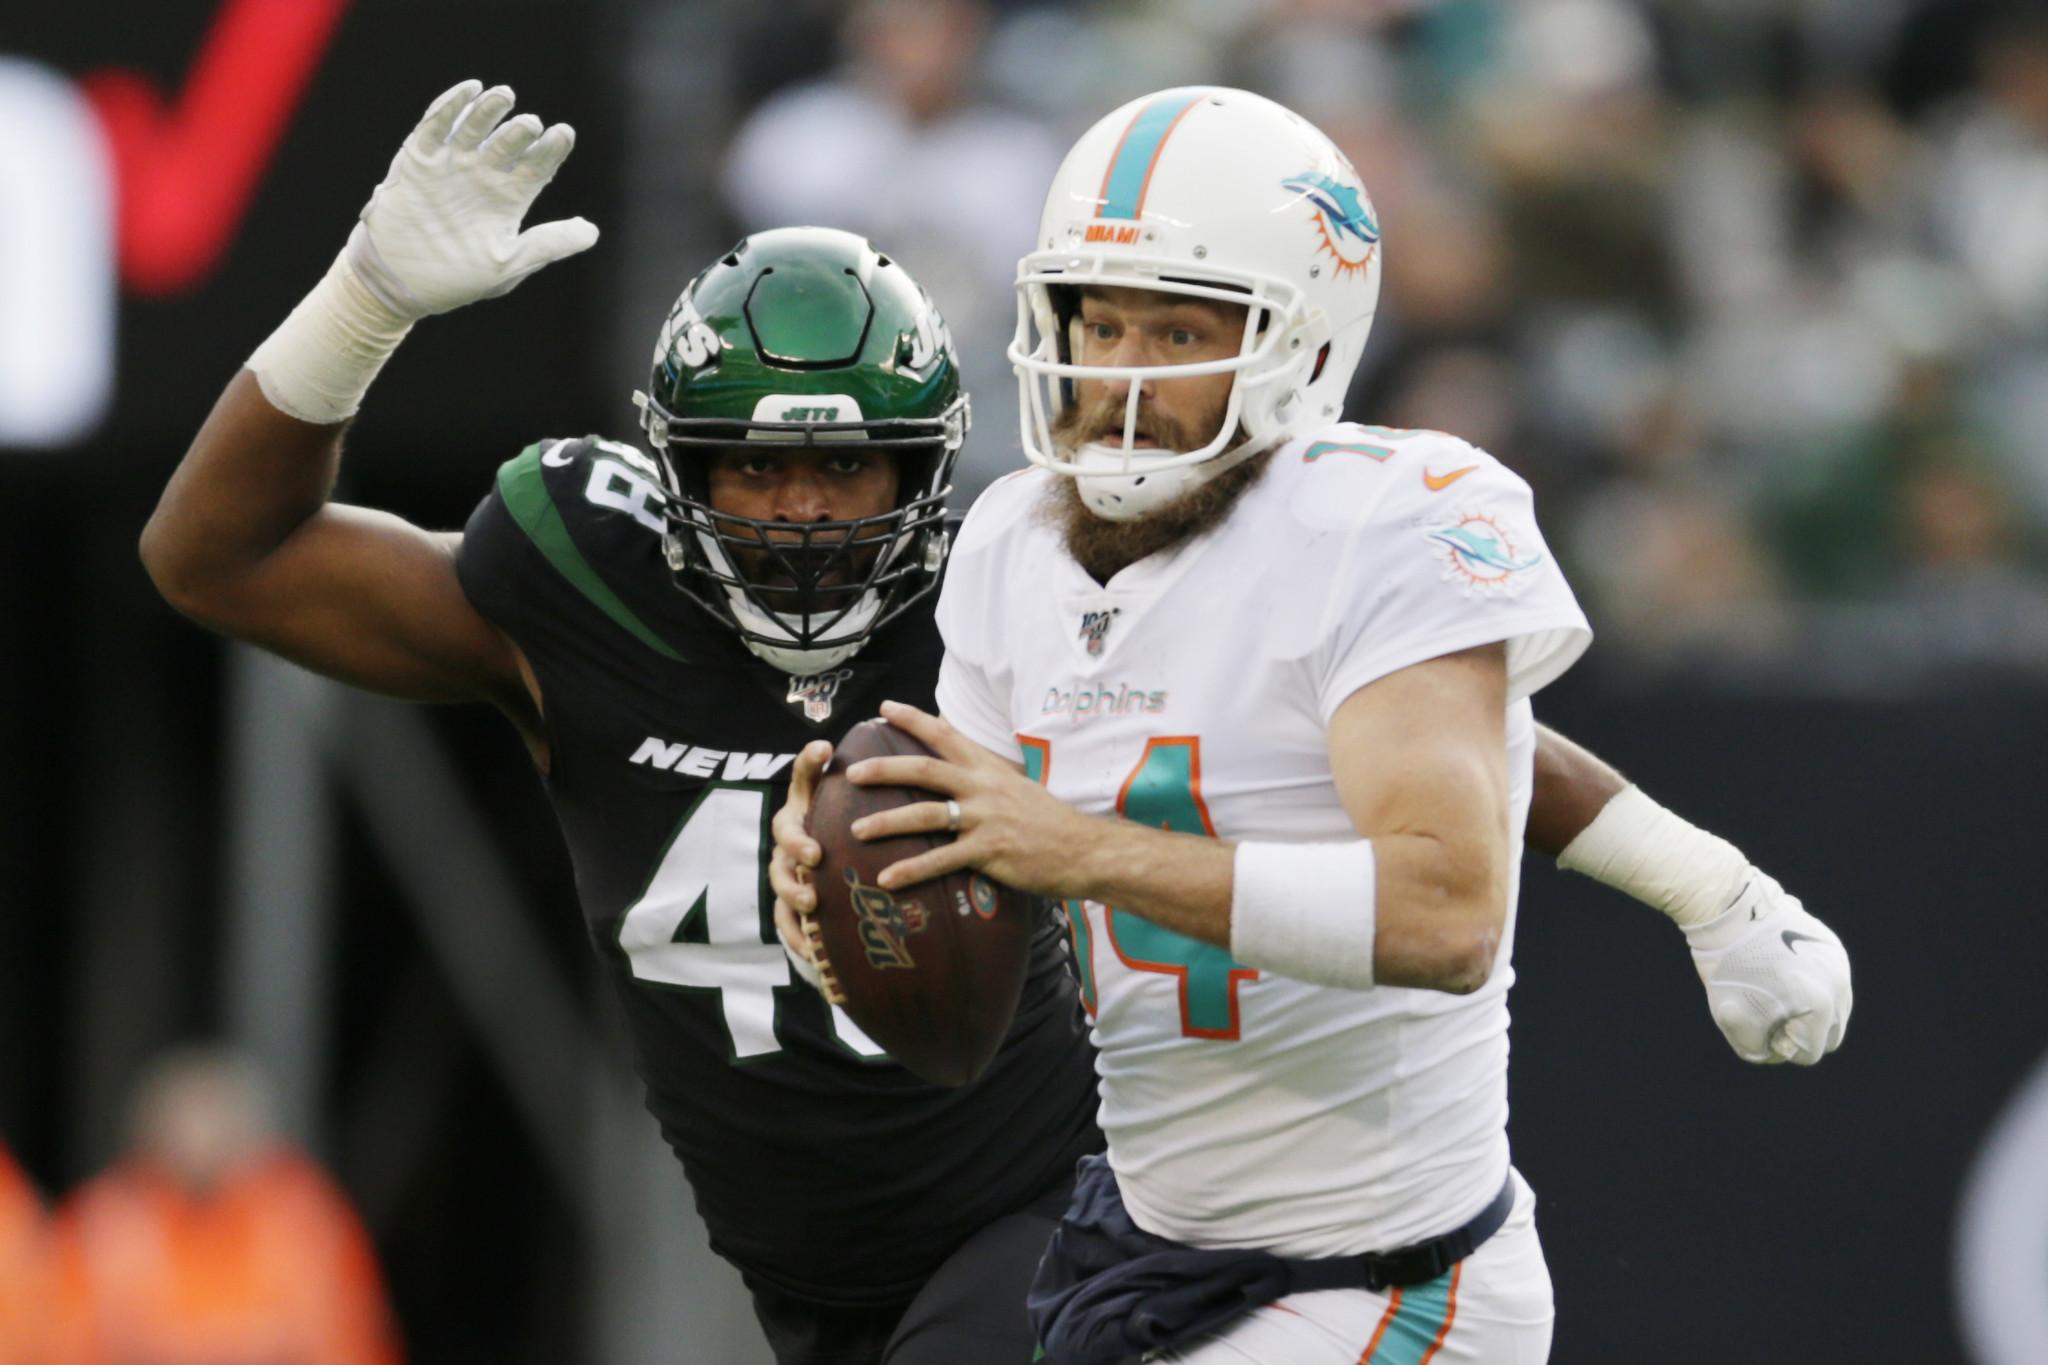 Jets, LB Jordan Jenkins closing in on deal: source